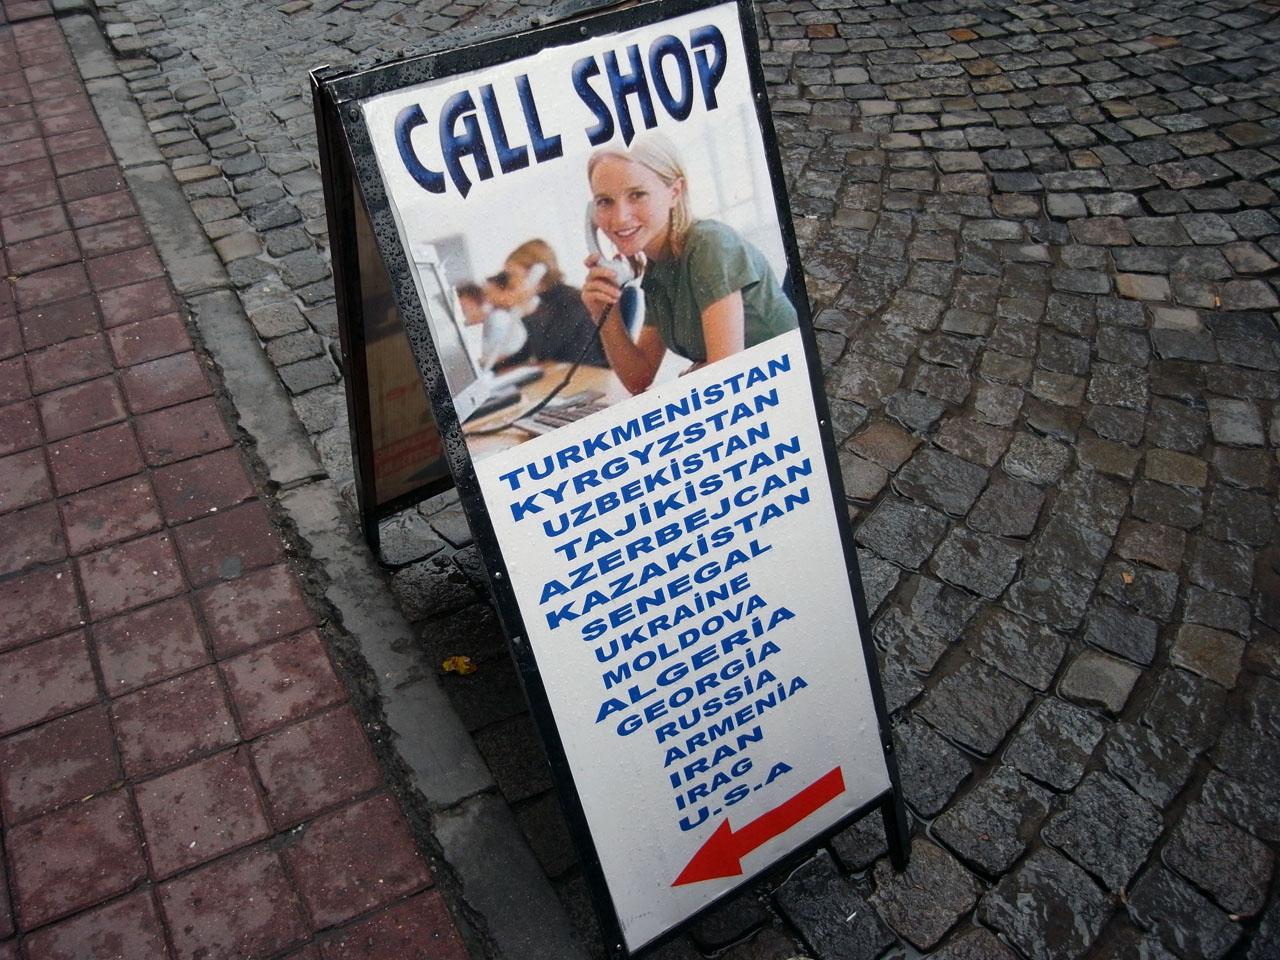 callshop-1